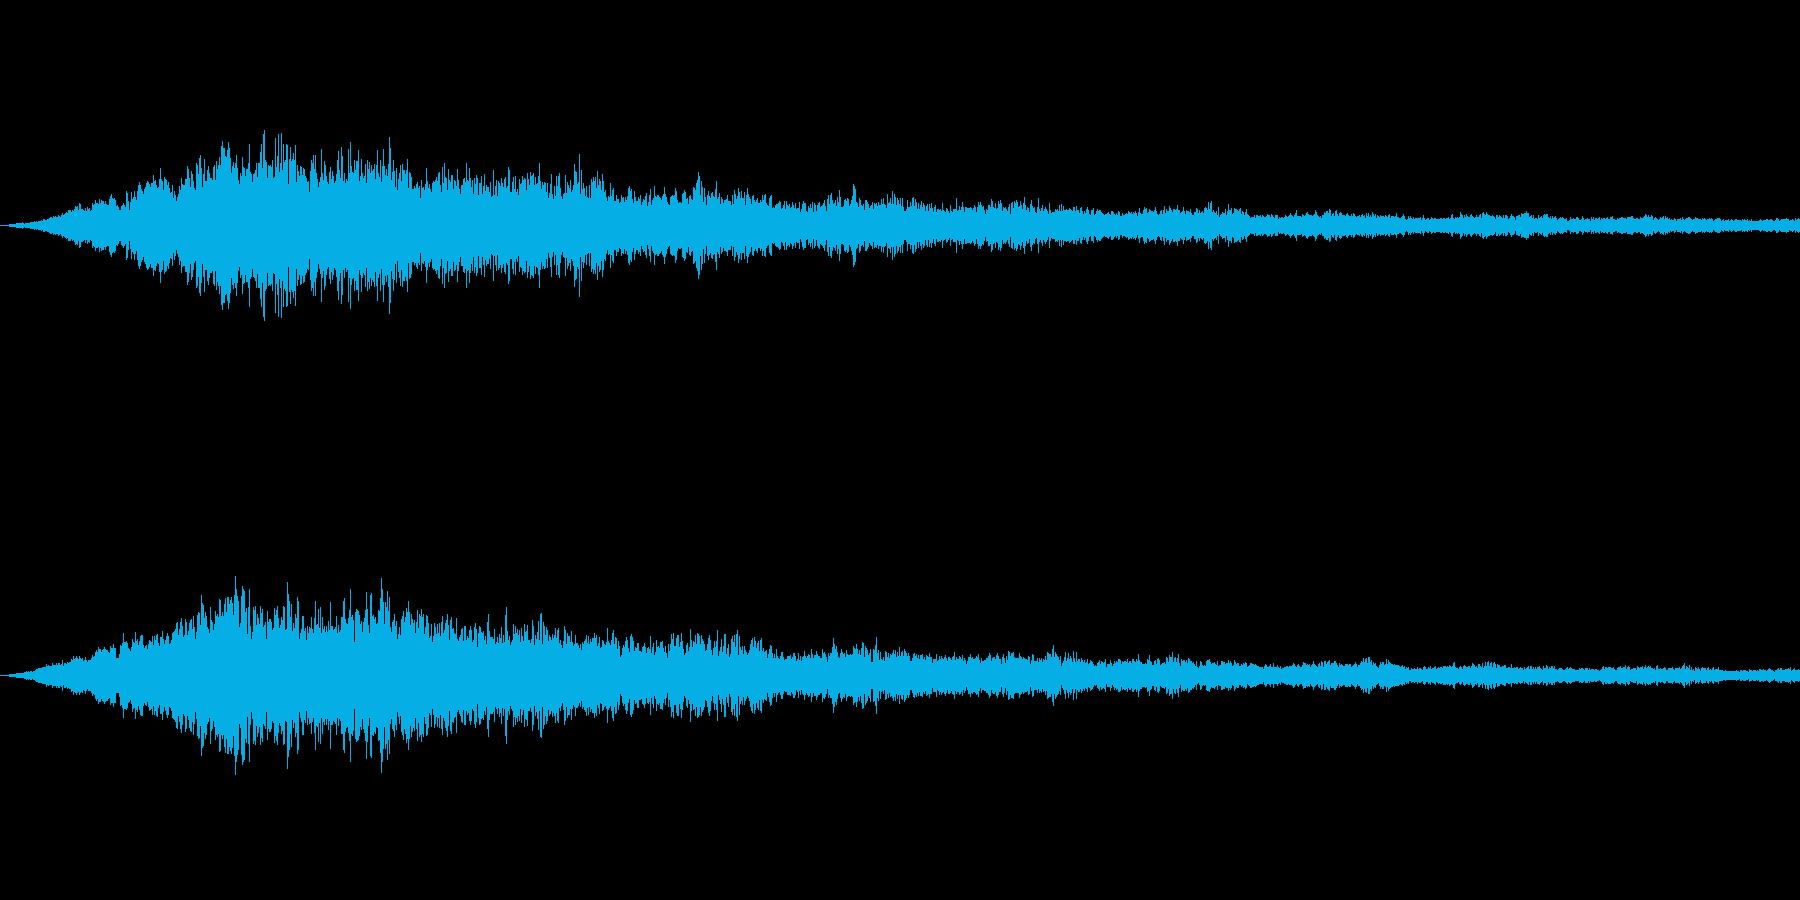 SFっぽい音その4です。「カララララー…の再生済みの波形